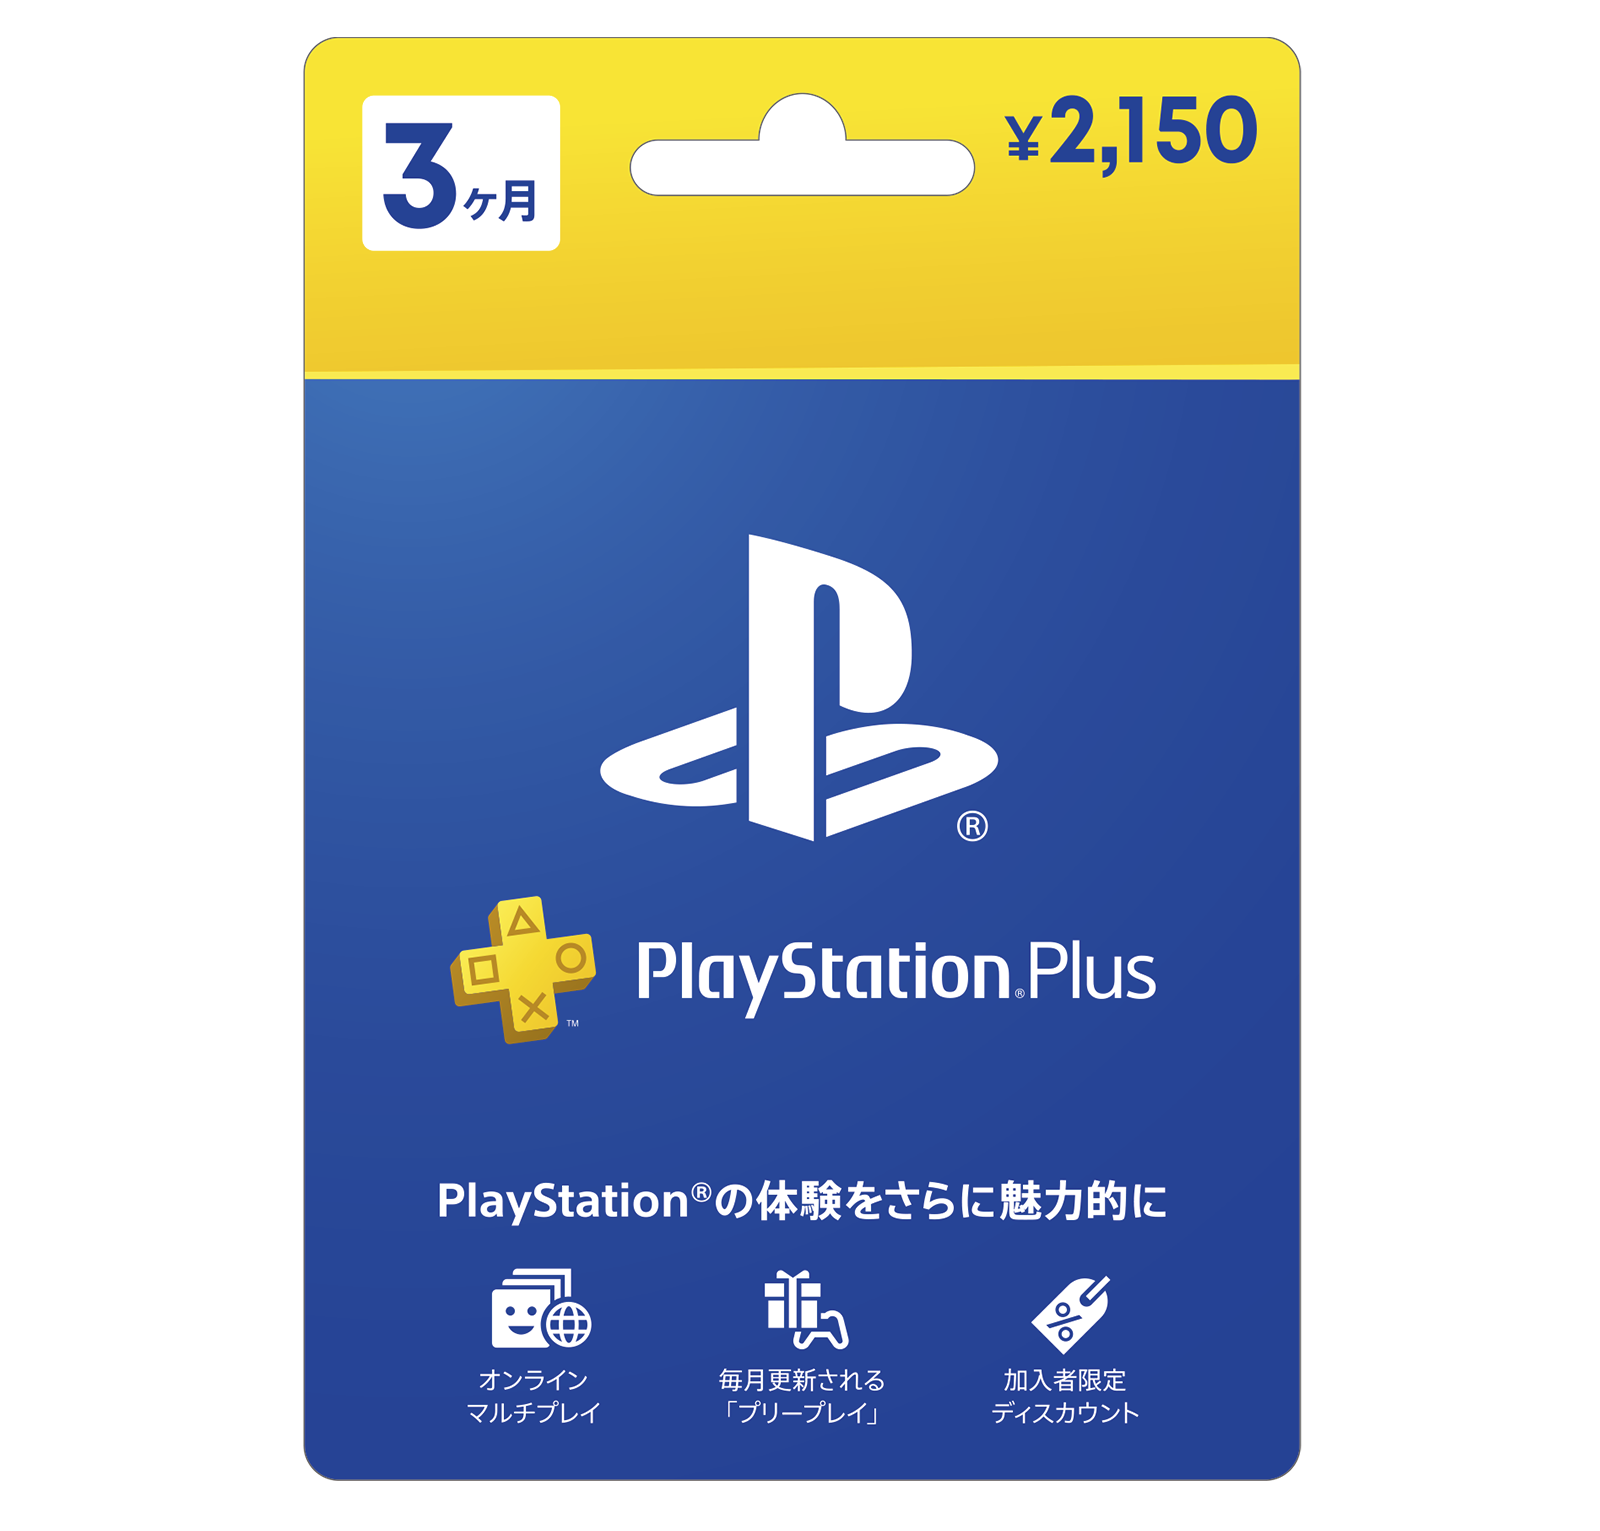 PS Plus 3ヶ月利用権